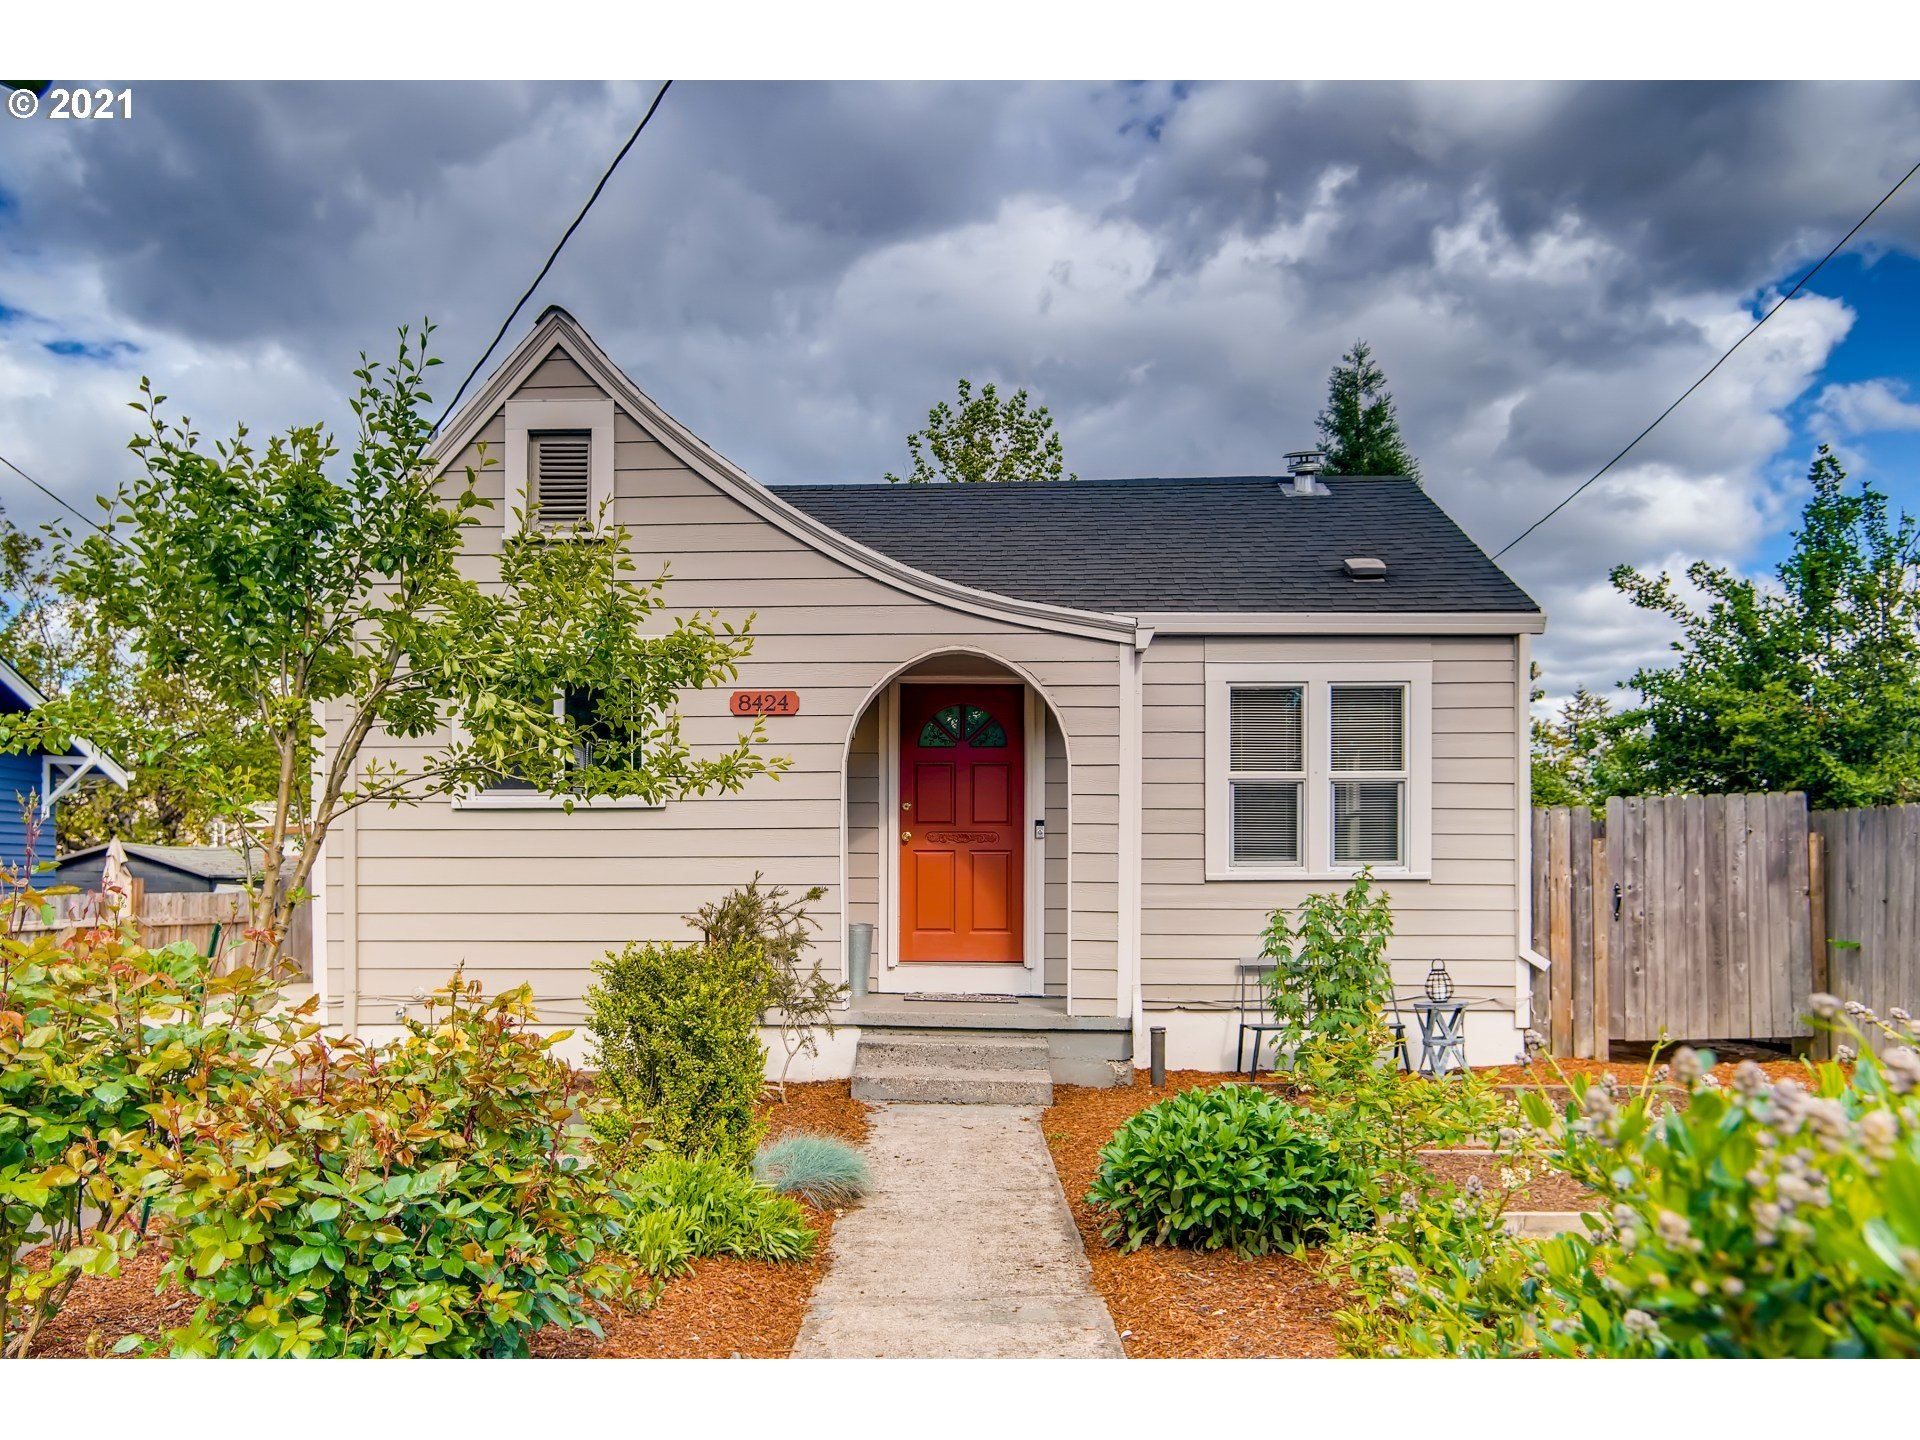 8424 N PENINSULAR AVE, Portland, OR 97217 - MLS#: 21592536